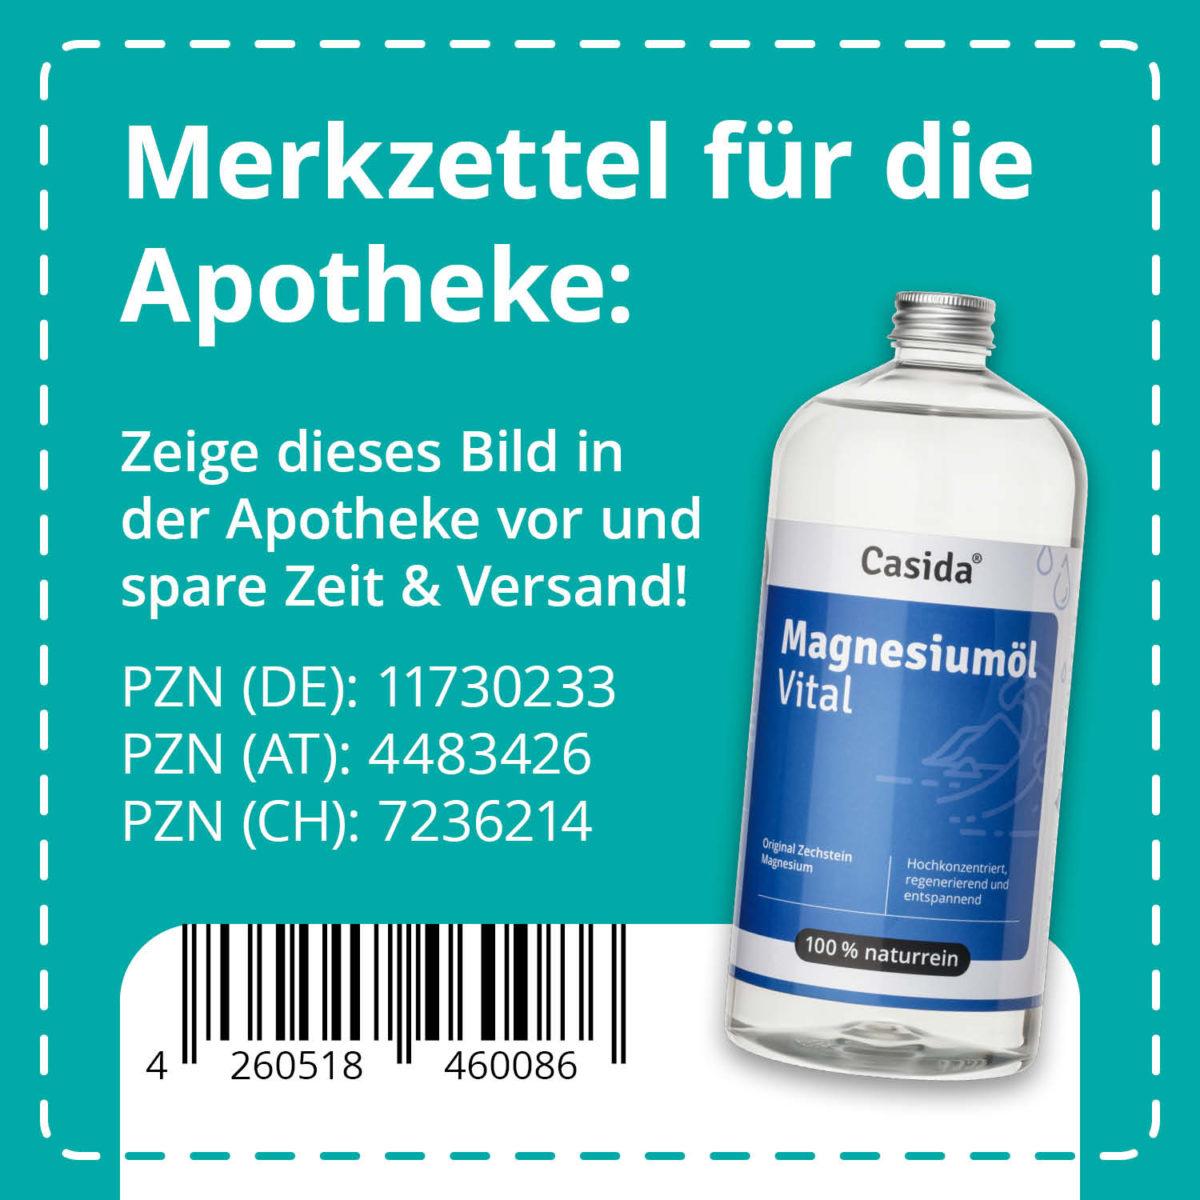 Casida Magnesiumöl Vital Zechstein 1000 ml 11730233 PZN Apotheke Nachfüllflasche Sport9